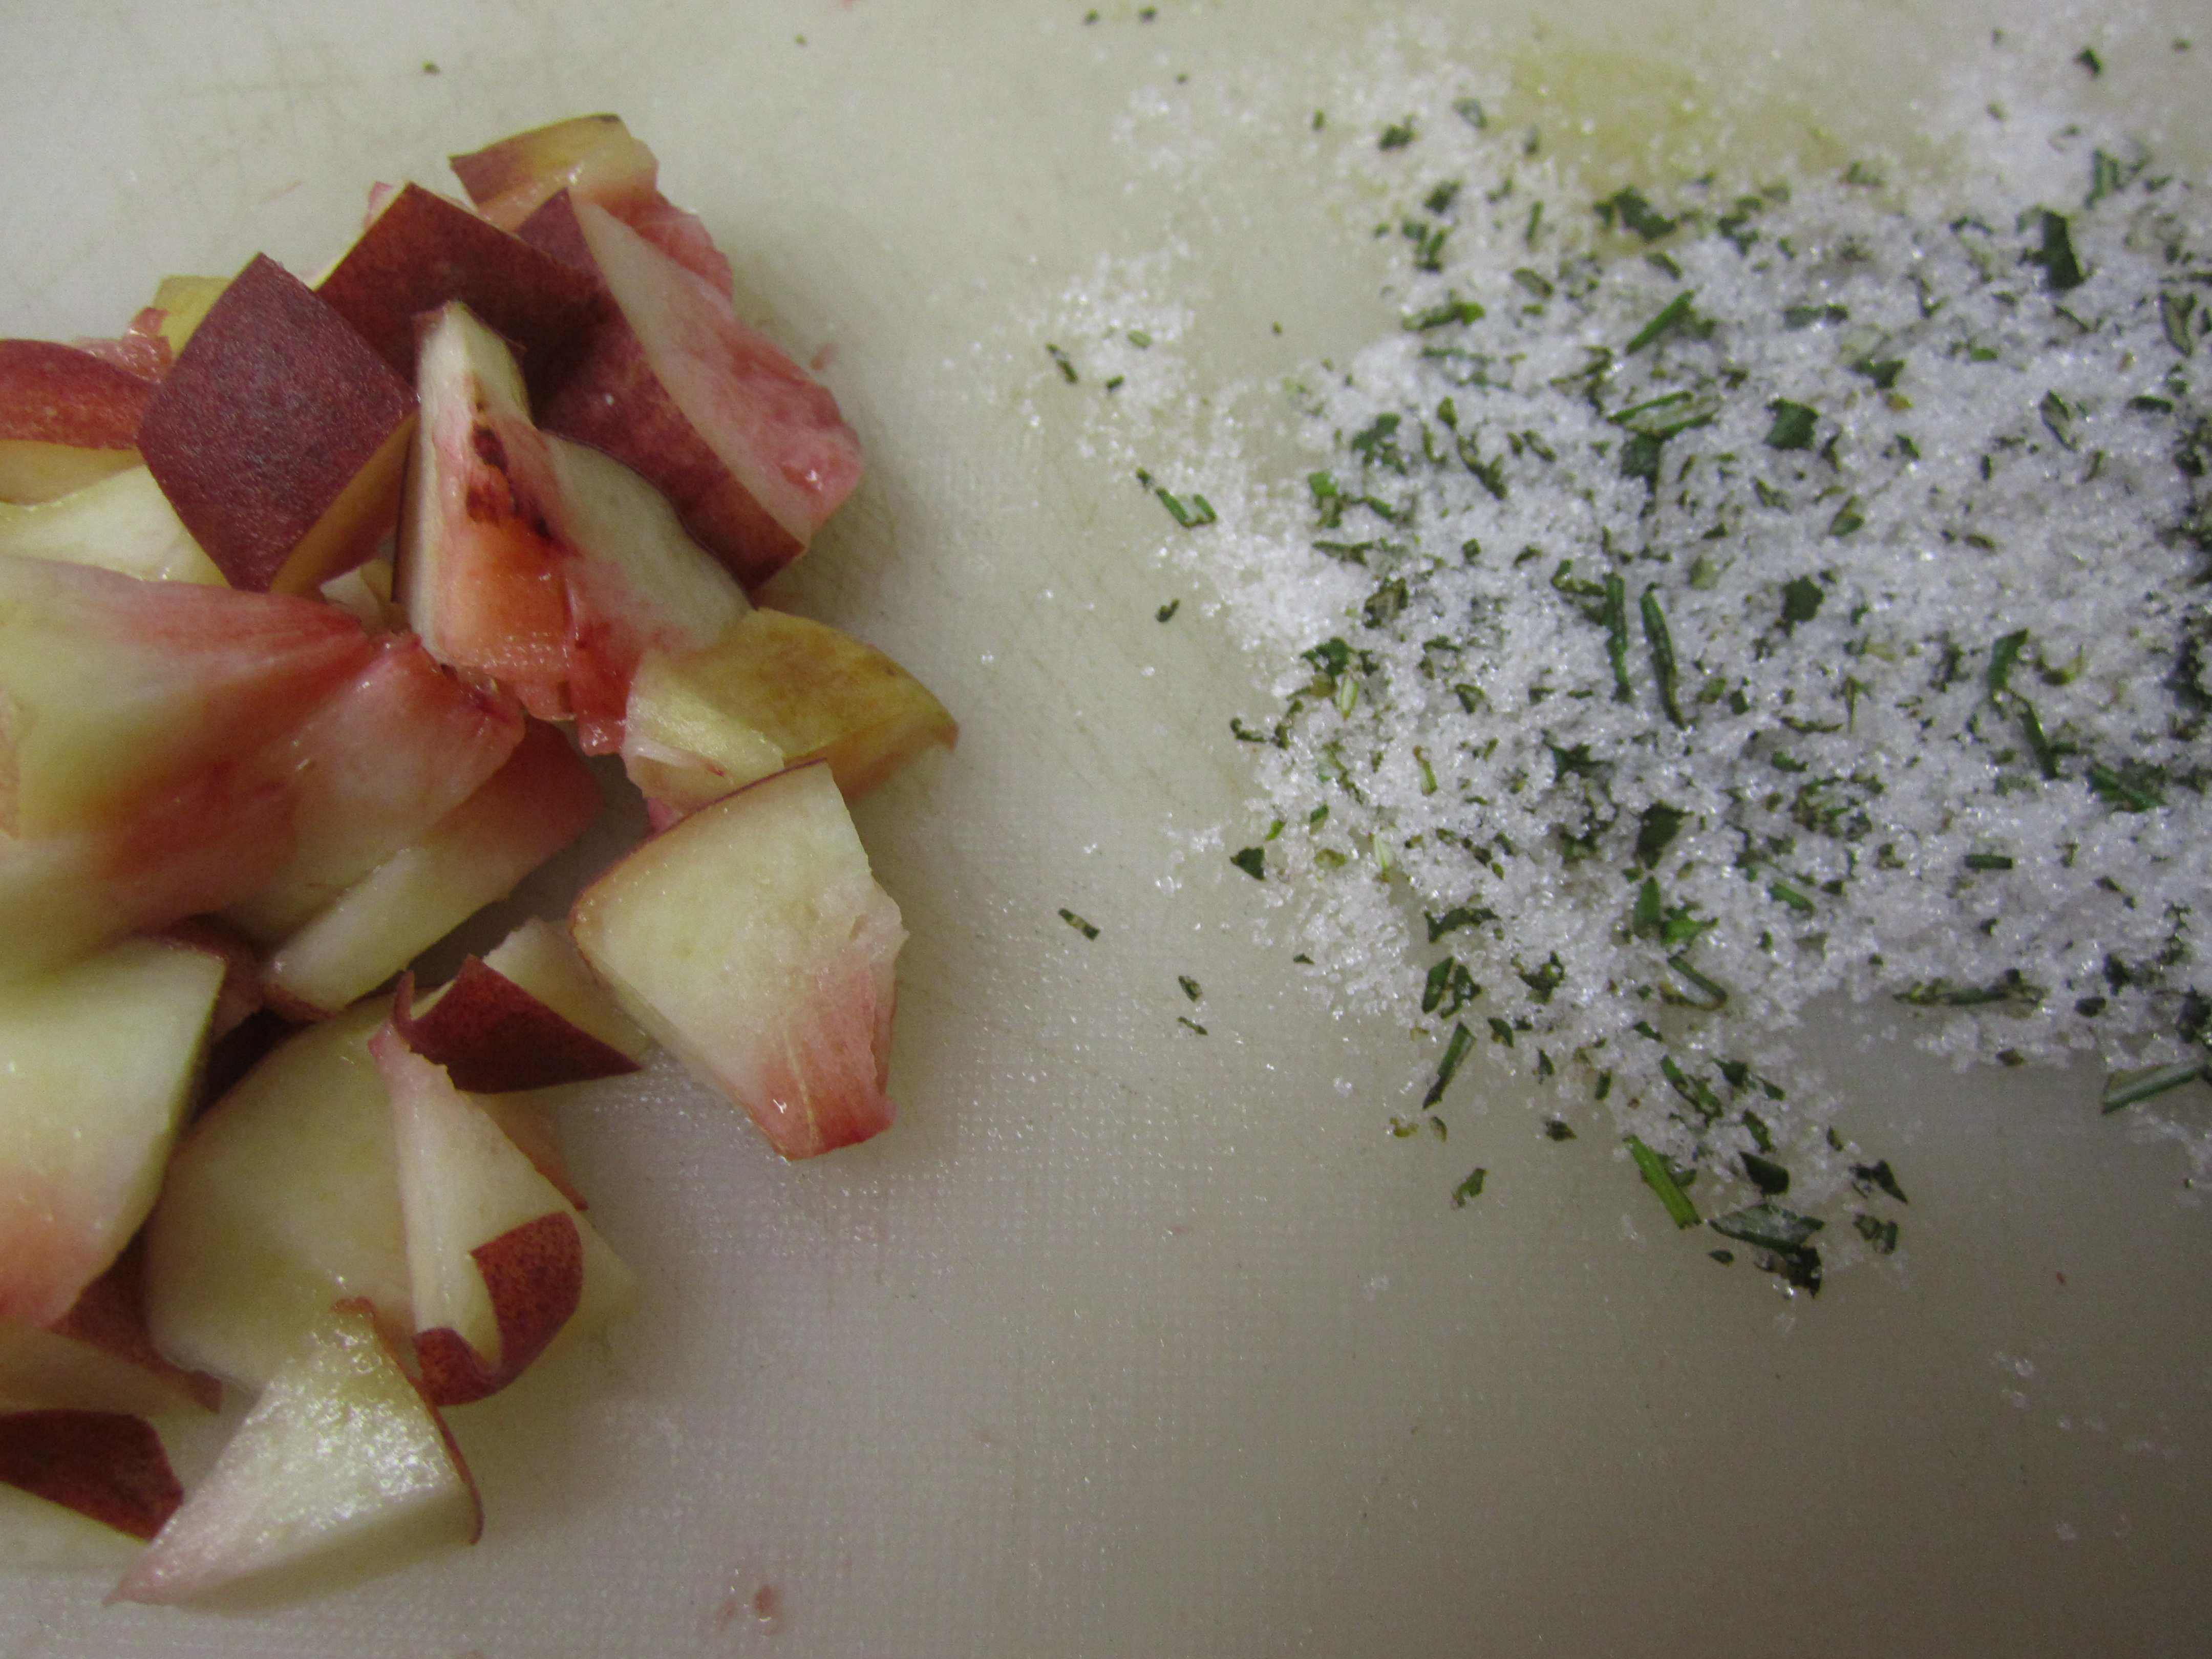 White Peach Scones with Rosemary Sugar | Victoria Sponge, Pease ...